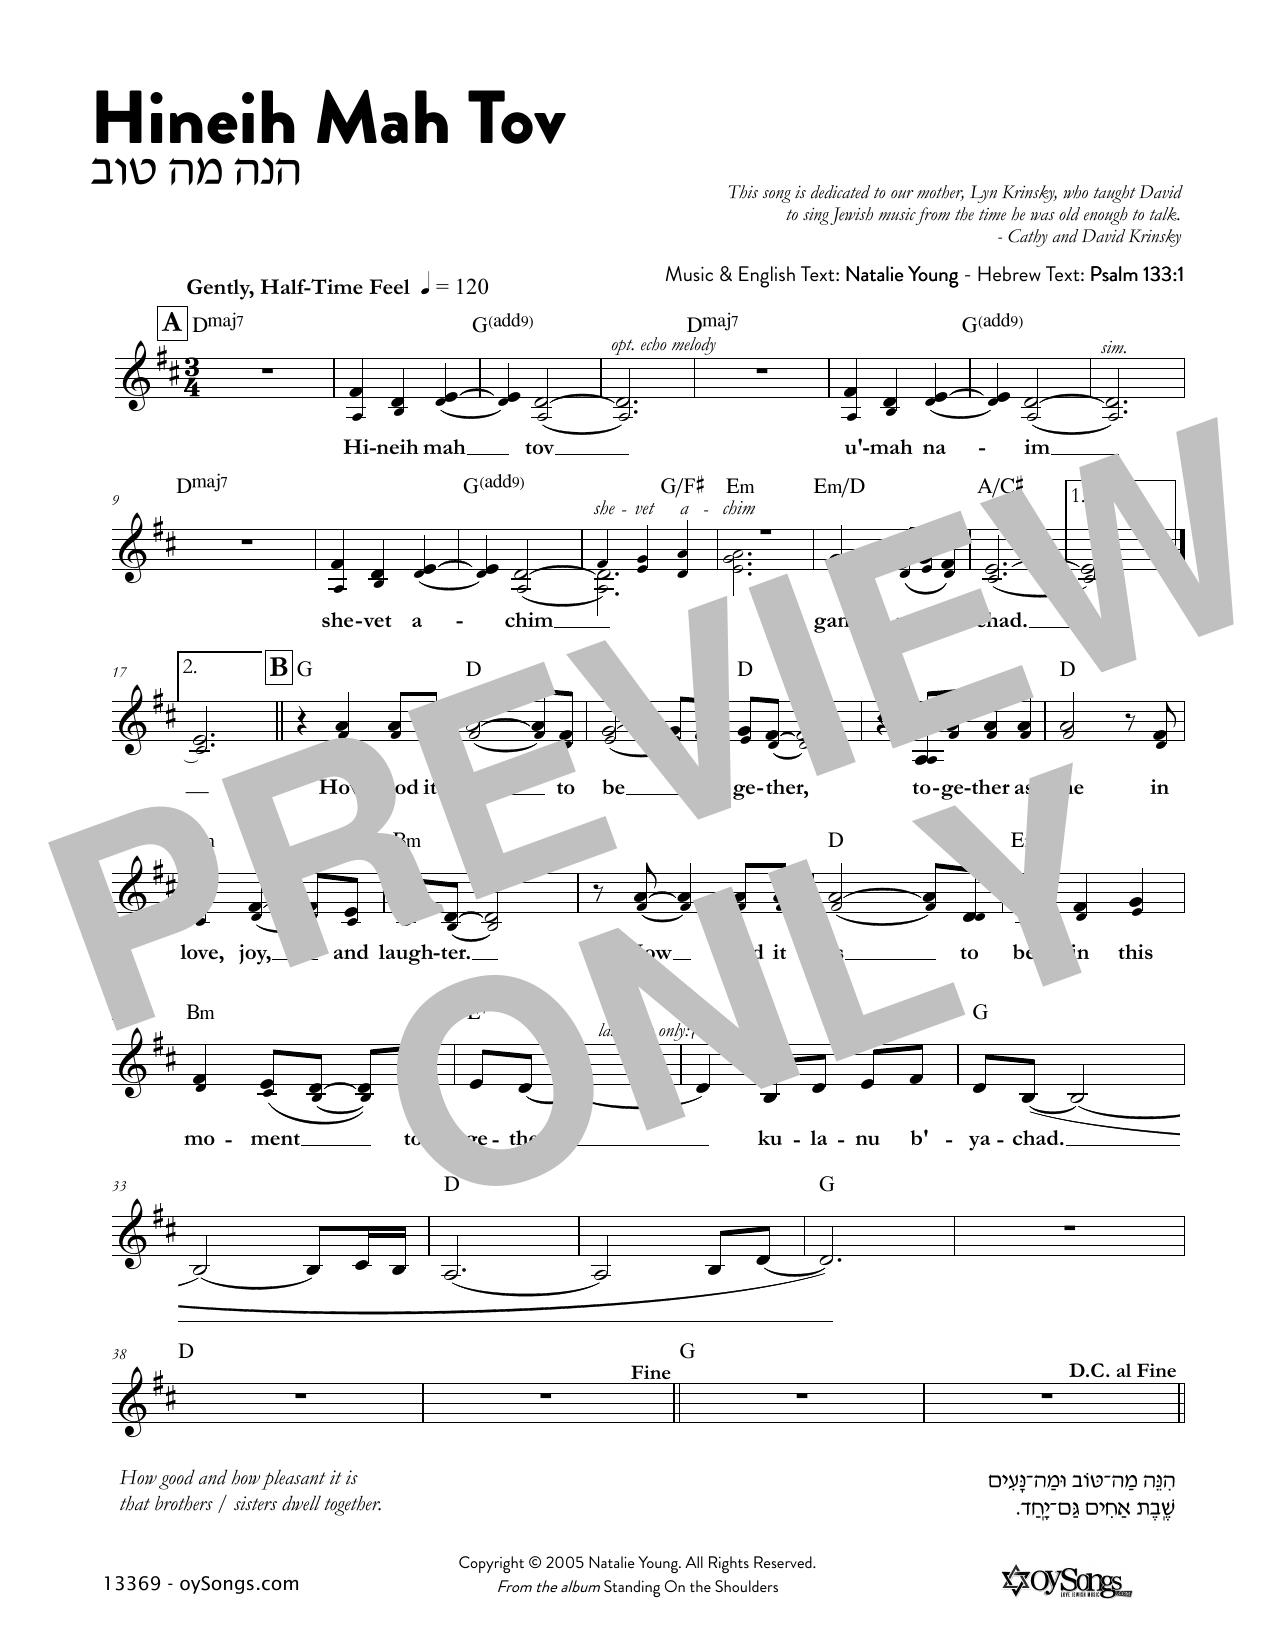 Hineih Mah Tov Sheet Music